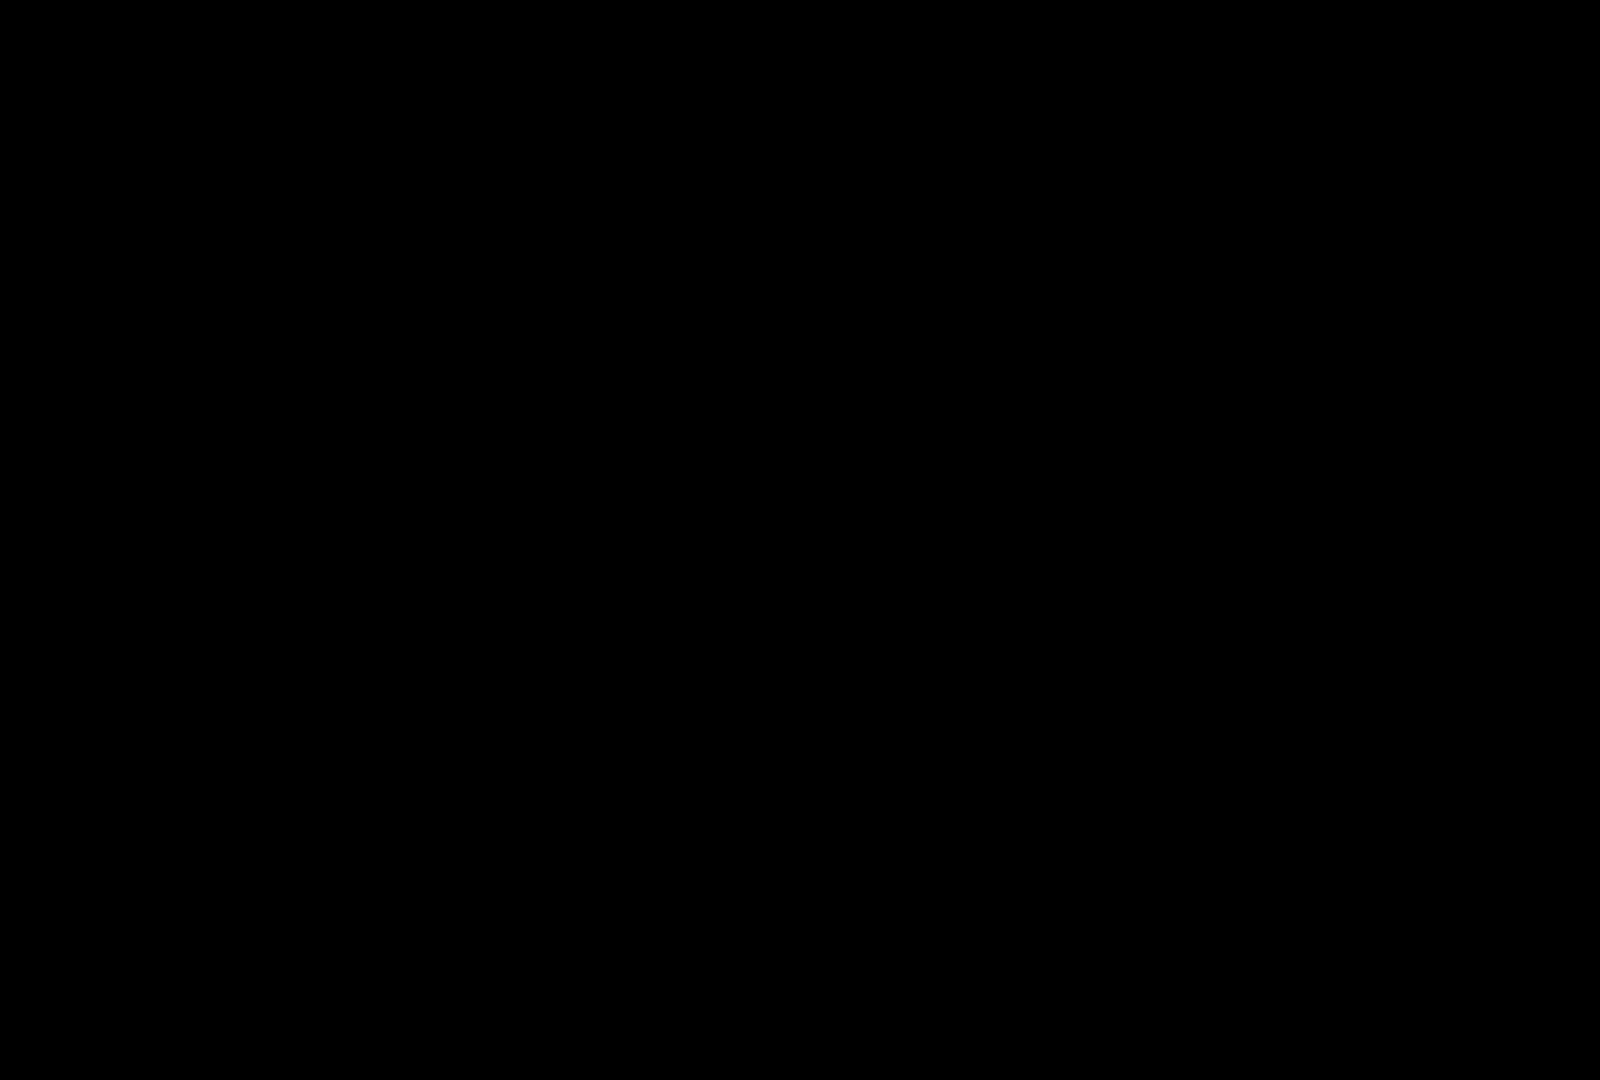 19201080a